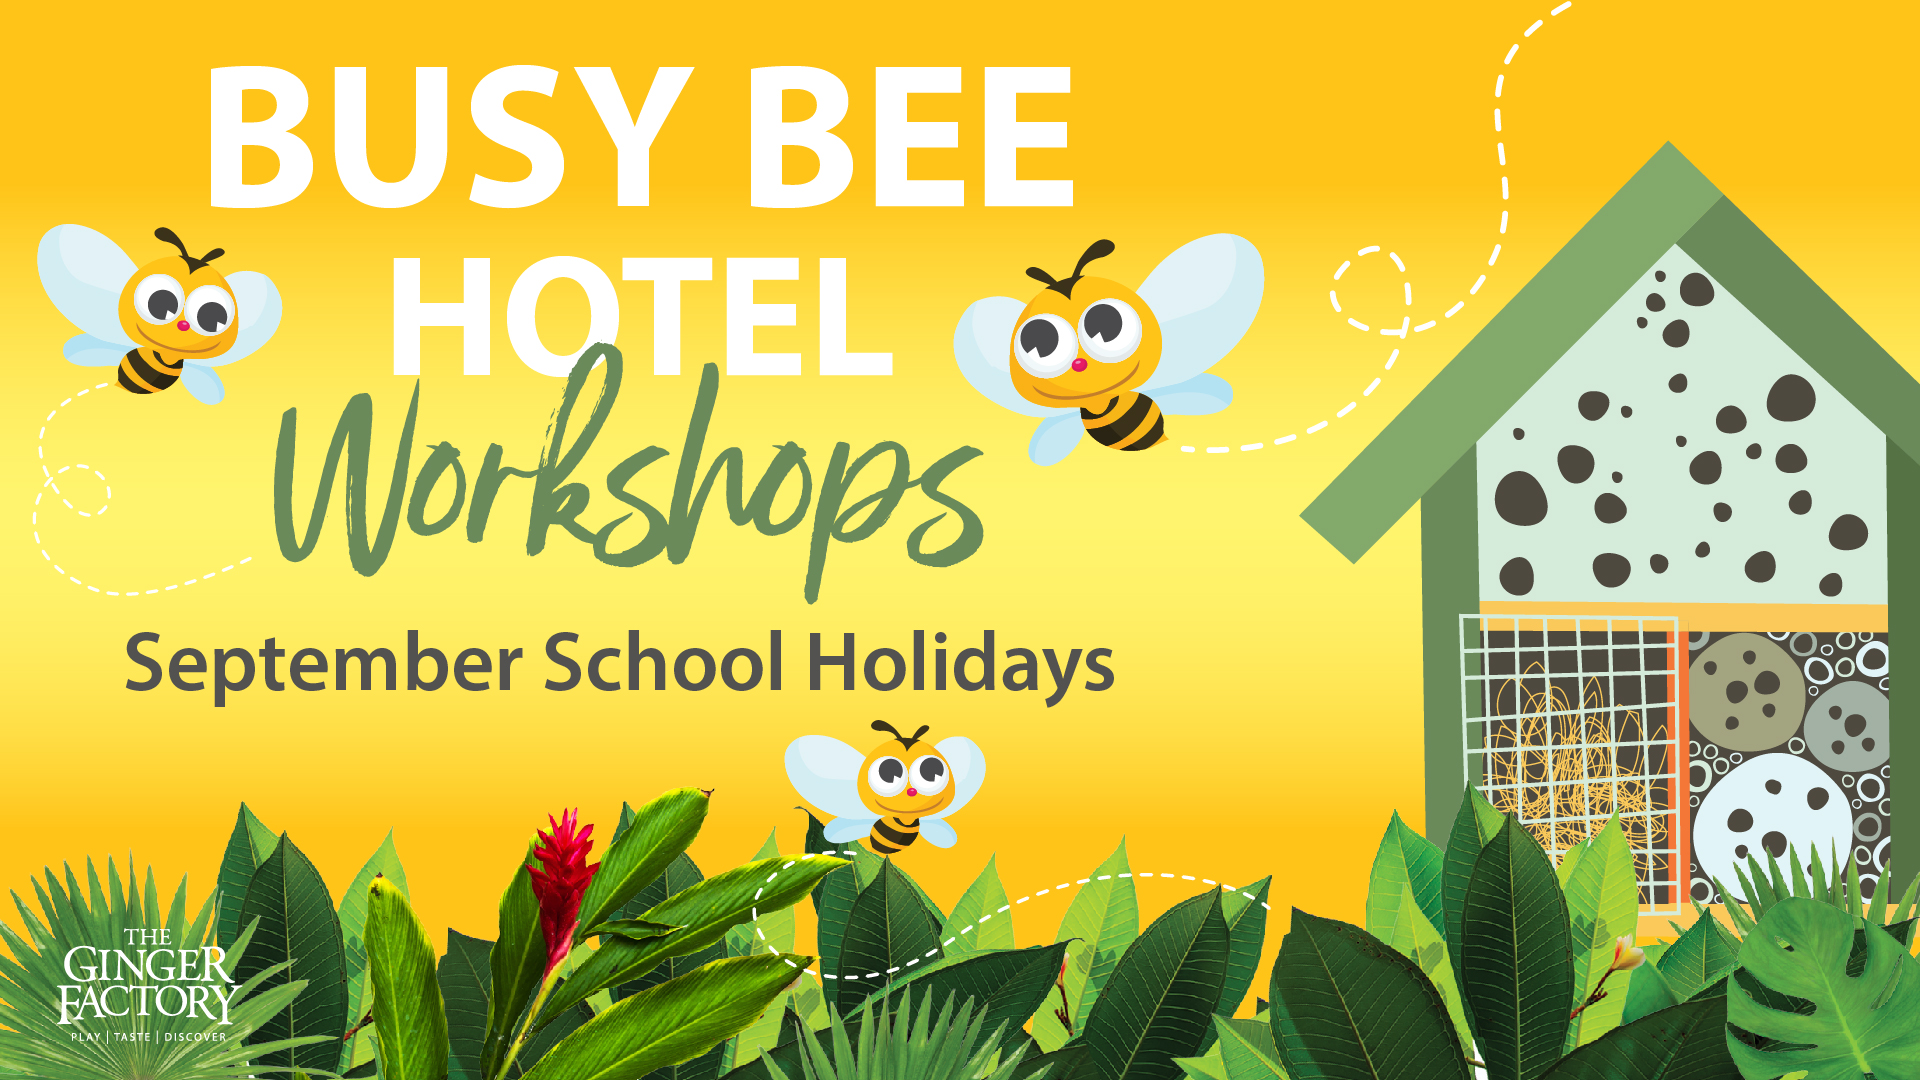 Bee Hotel Workshop Website Landing Page 01 (3)